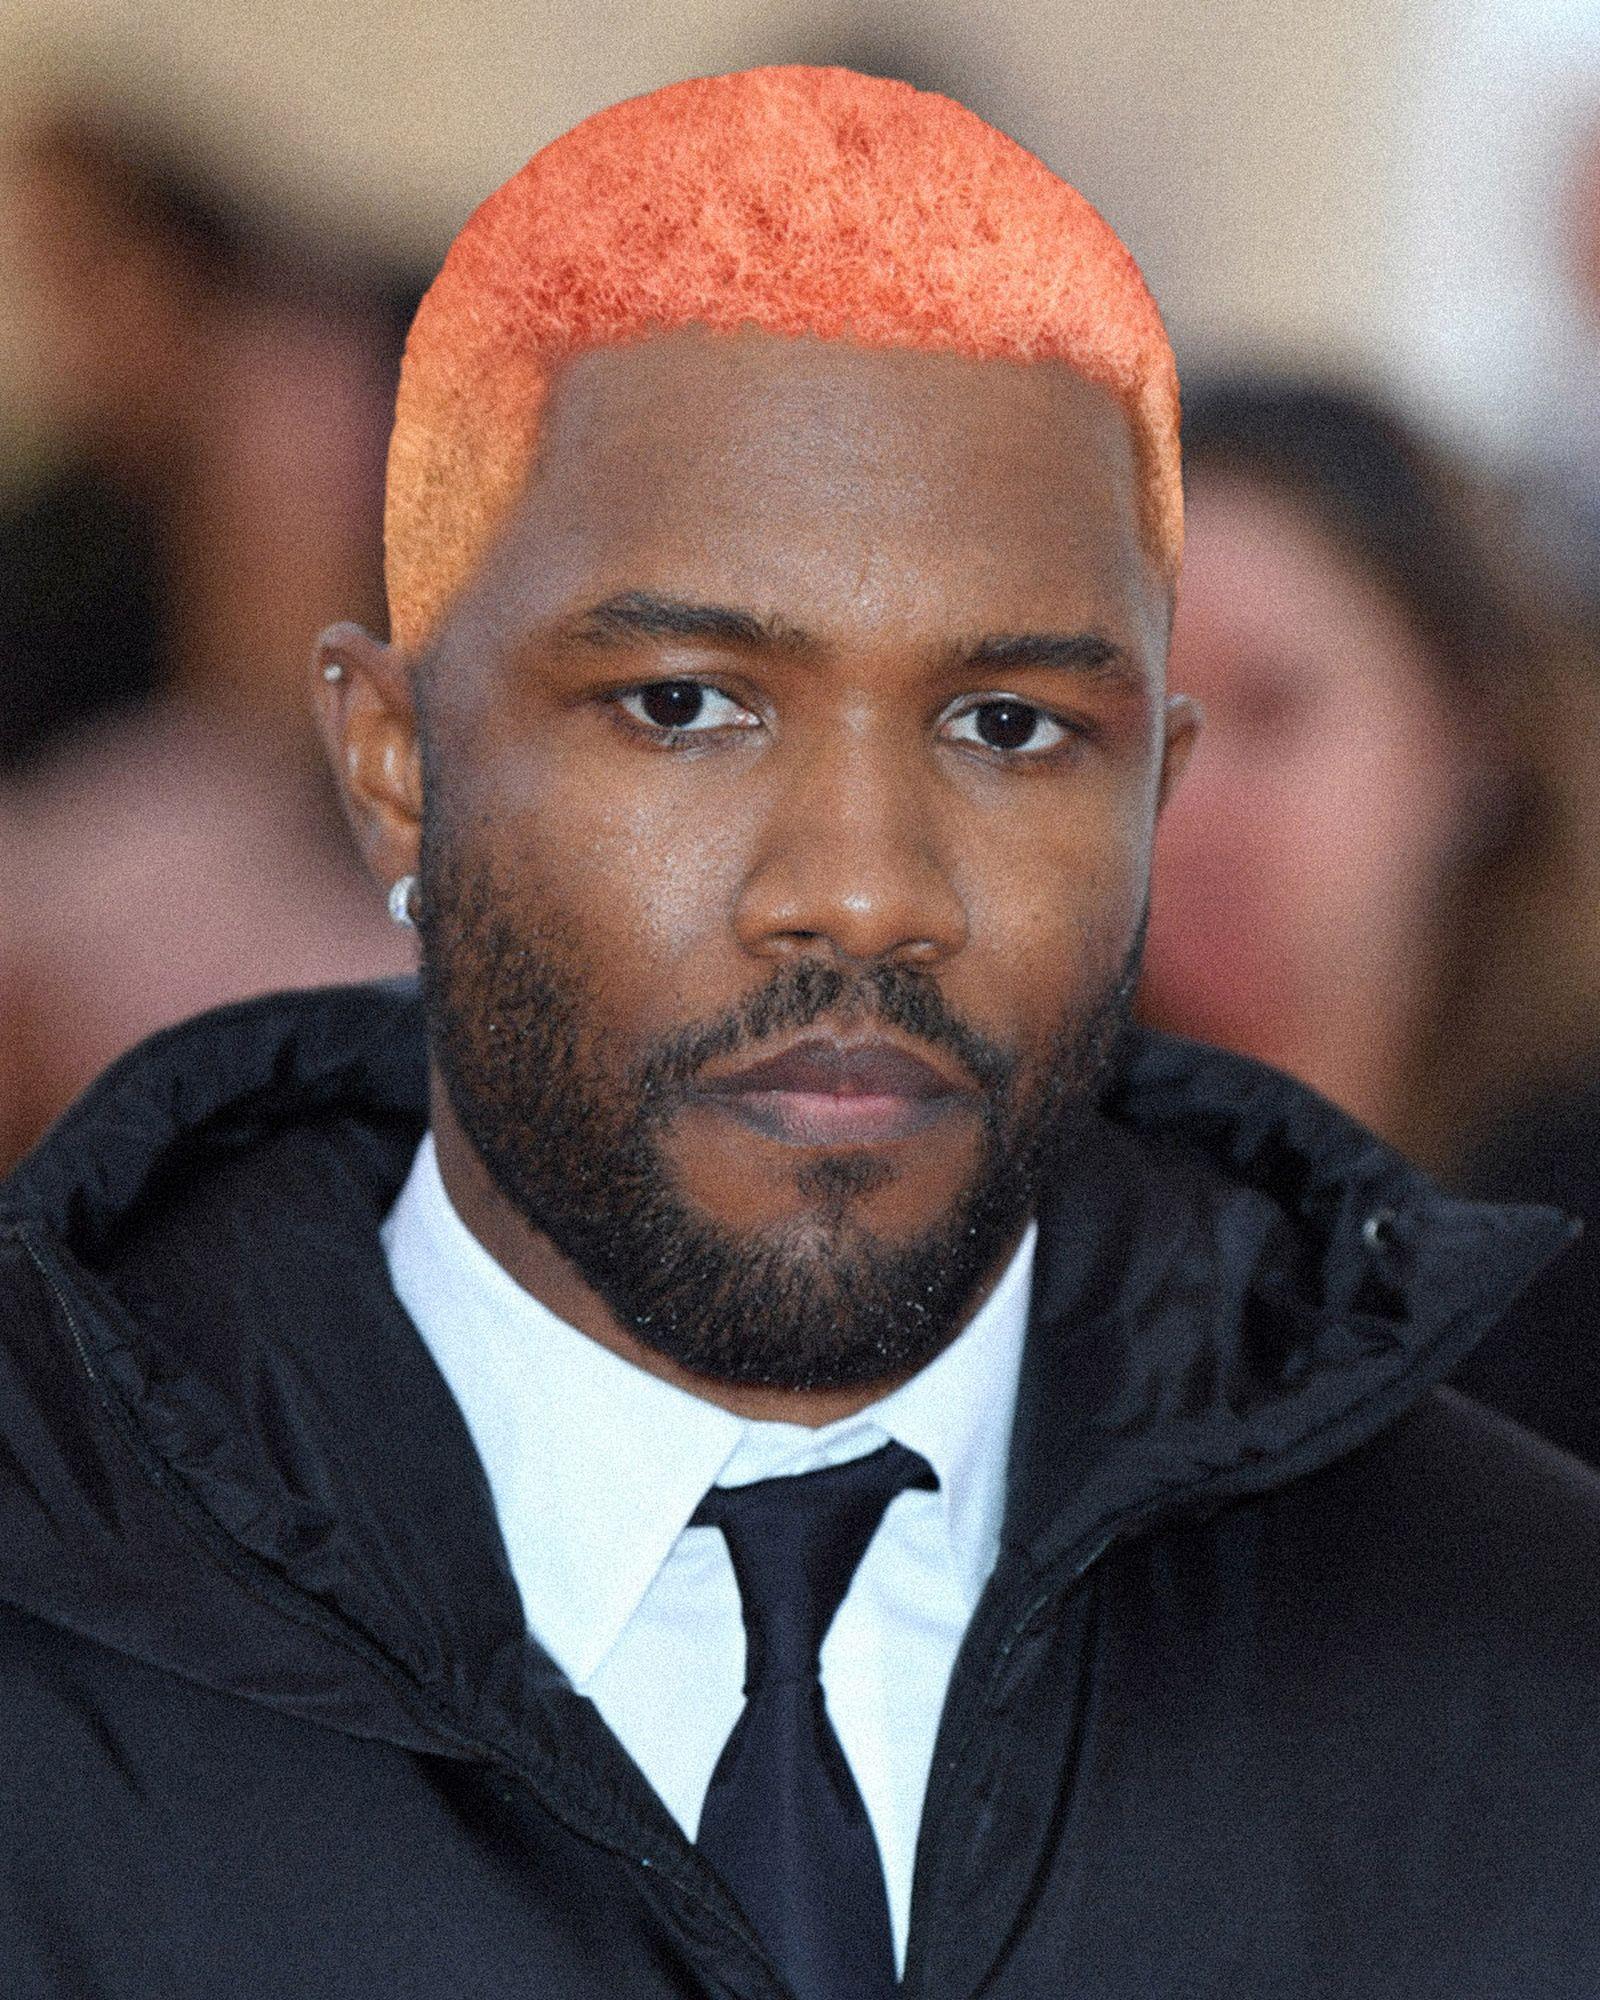 sgp-hair-dye-Frank_Ocean_orange_FIN